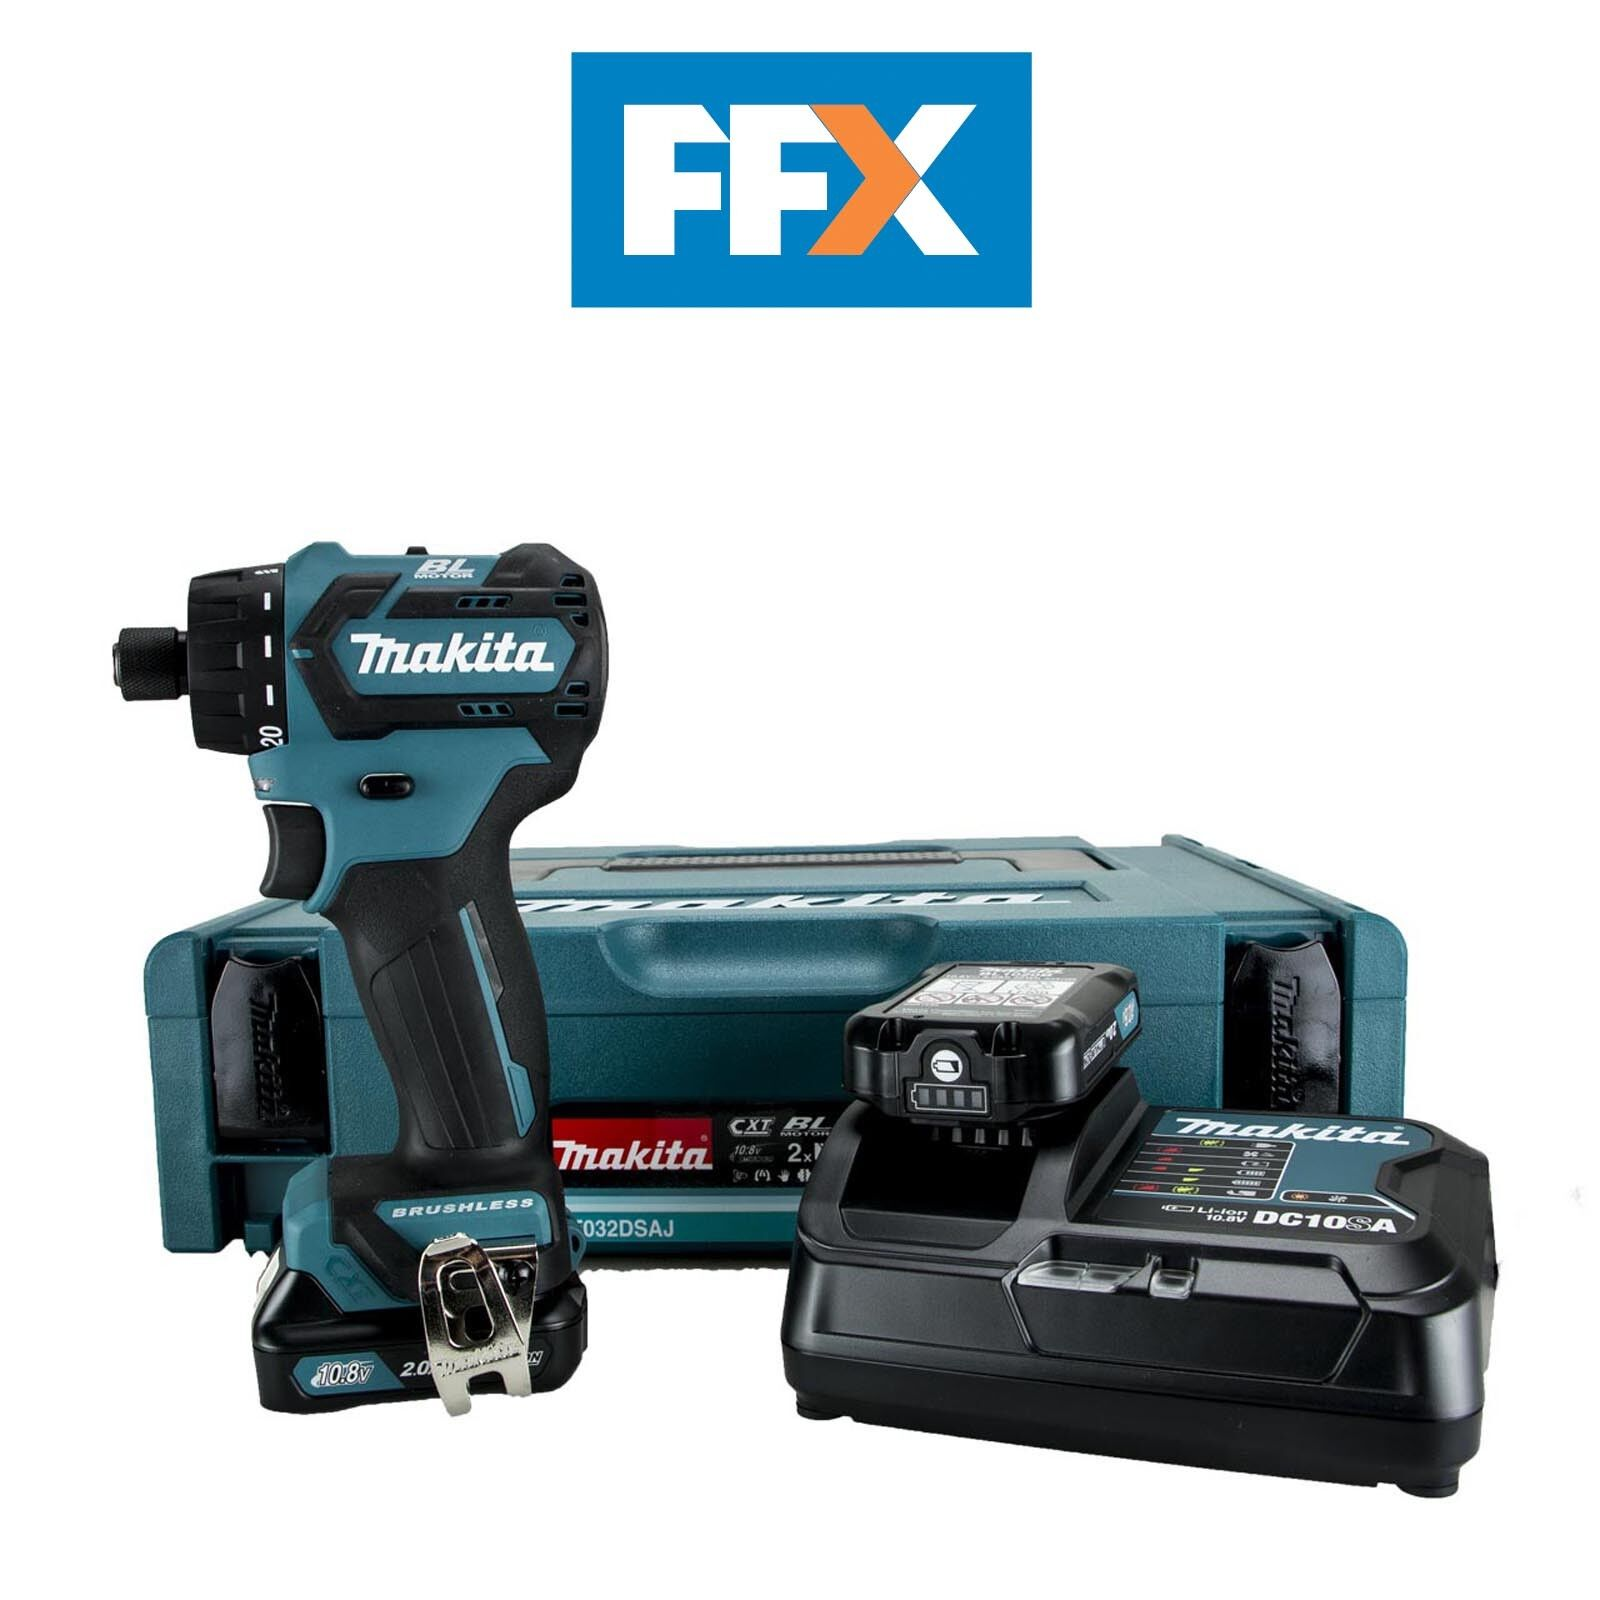 Makita DF032DSAJ 10.8V CXT 2x2.0Ah Drill Driver Makpac Kit